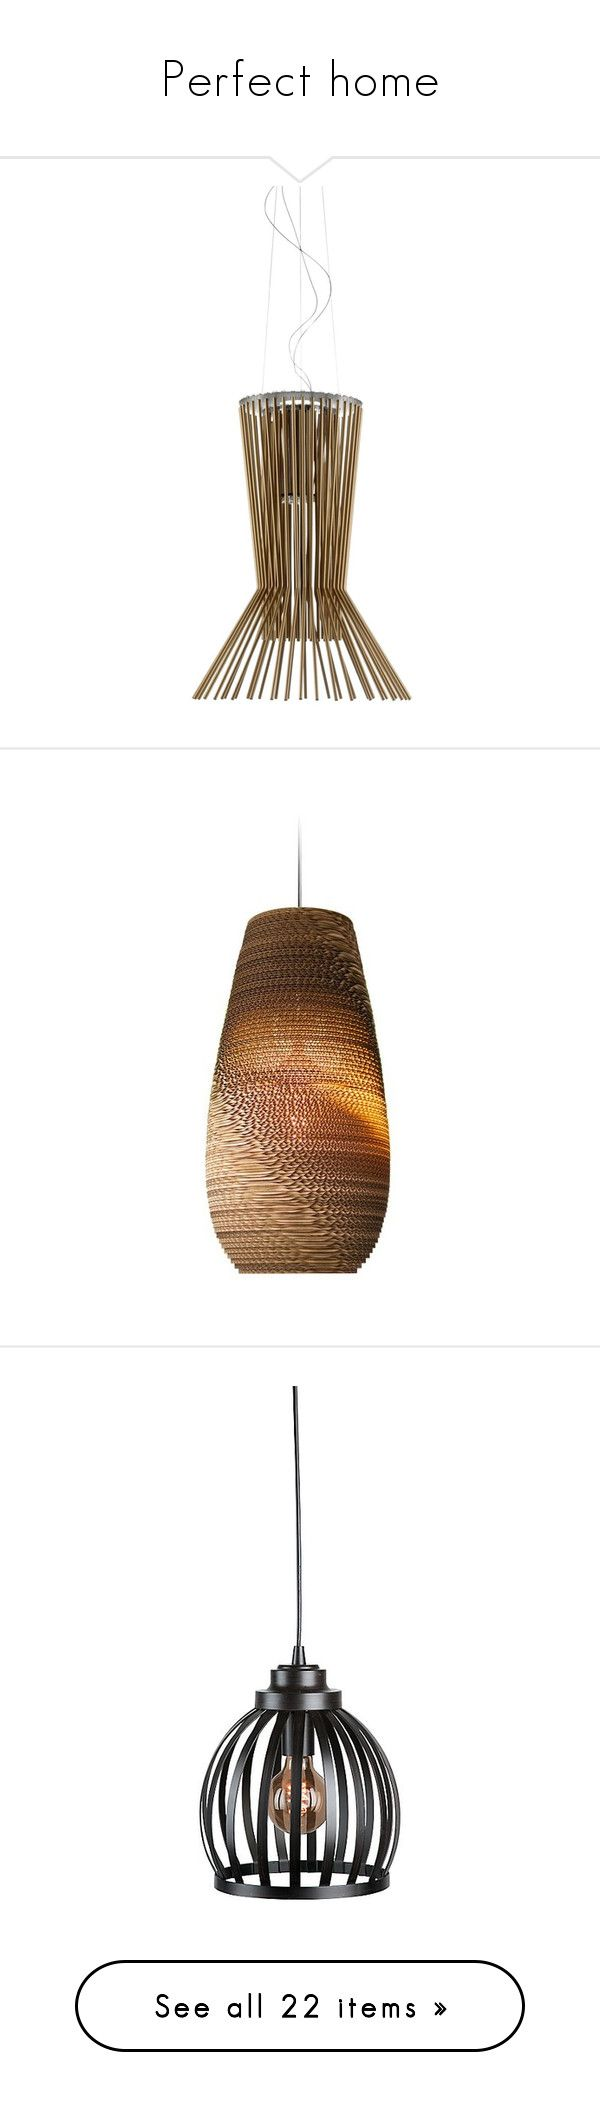 best 25 lampe halog ne ideas on pinterest halog ne eclairage neon and luminaires fluorescents. Black Bedroom Furniture Sets. Home Design Ideas